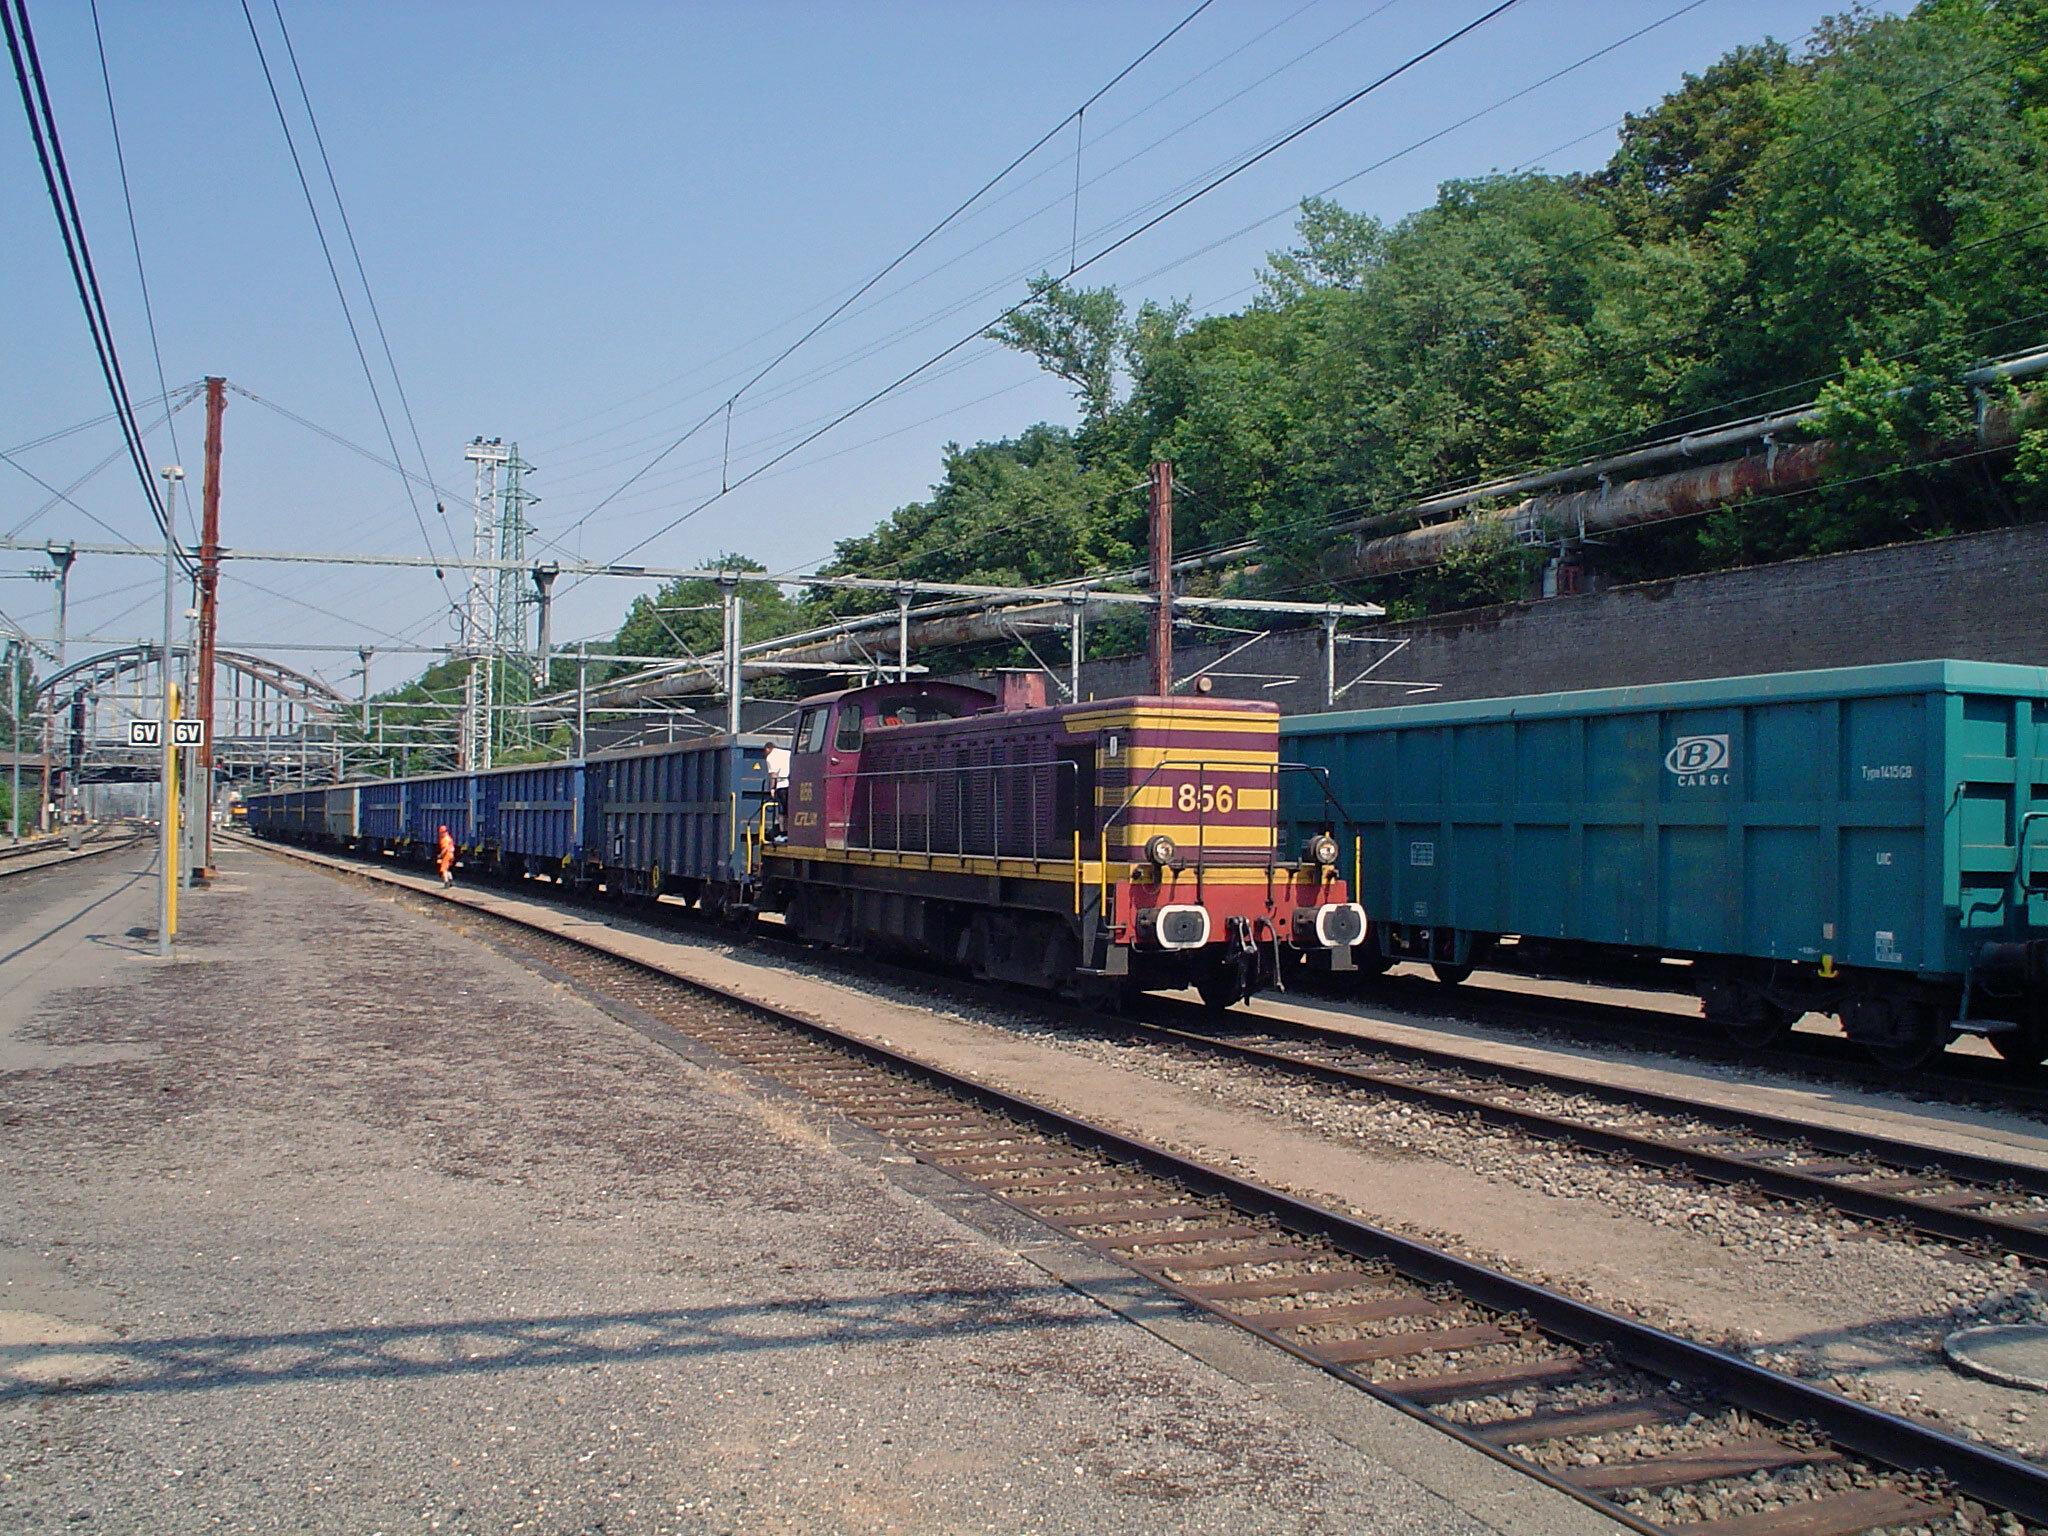 20060714-3